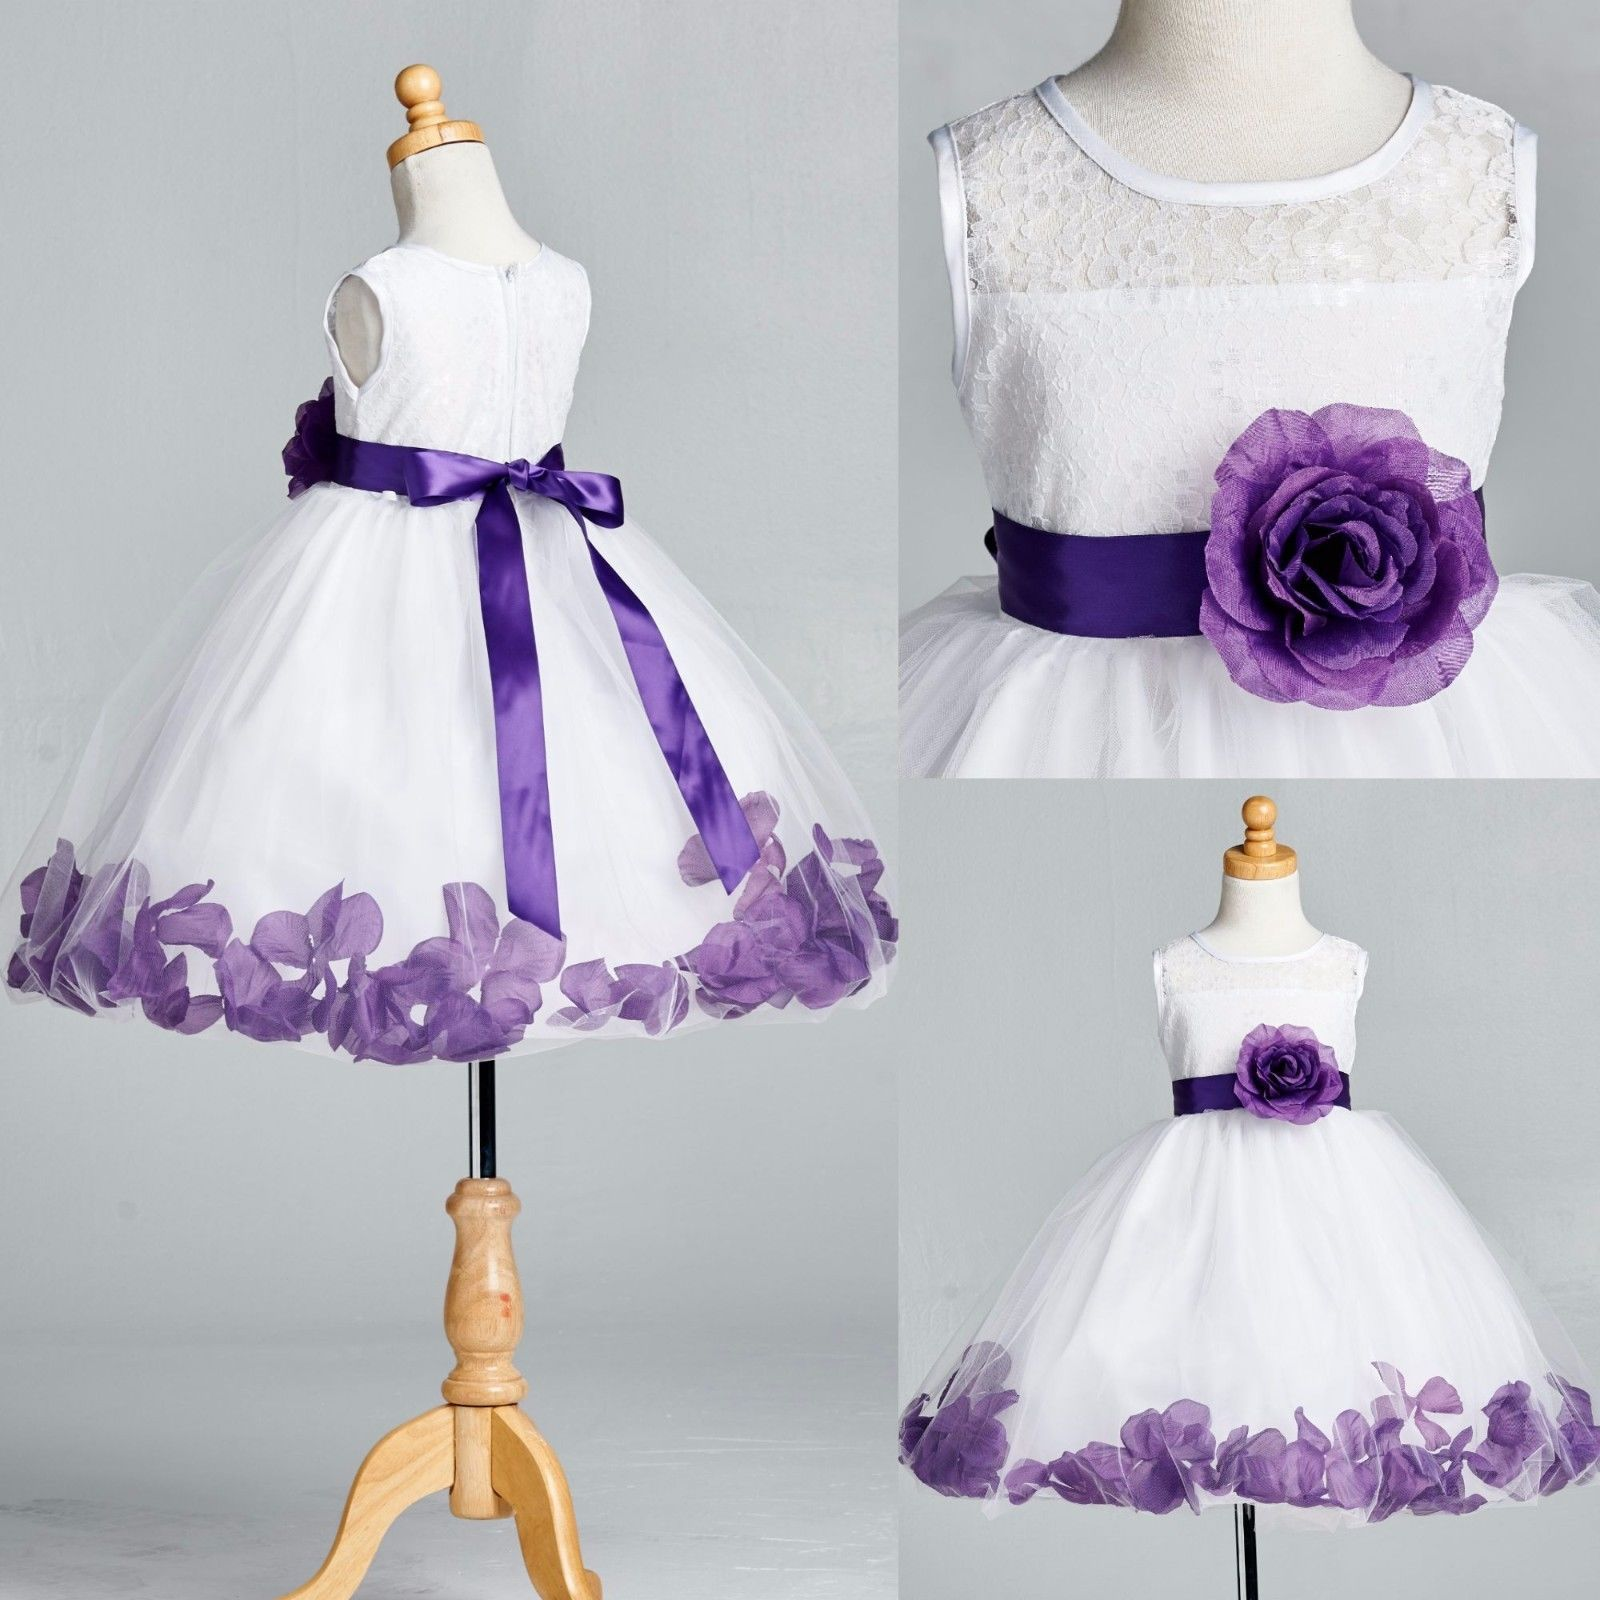 4bdd54e29 S l1600. S l1600. Previous. White Floral Lace Purple Rose Petal Tulle Dress  Flower Girl Easter ...